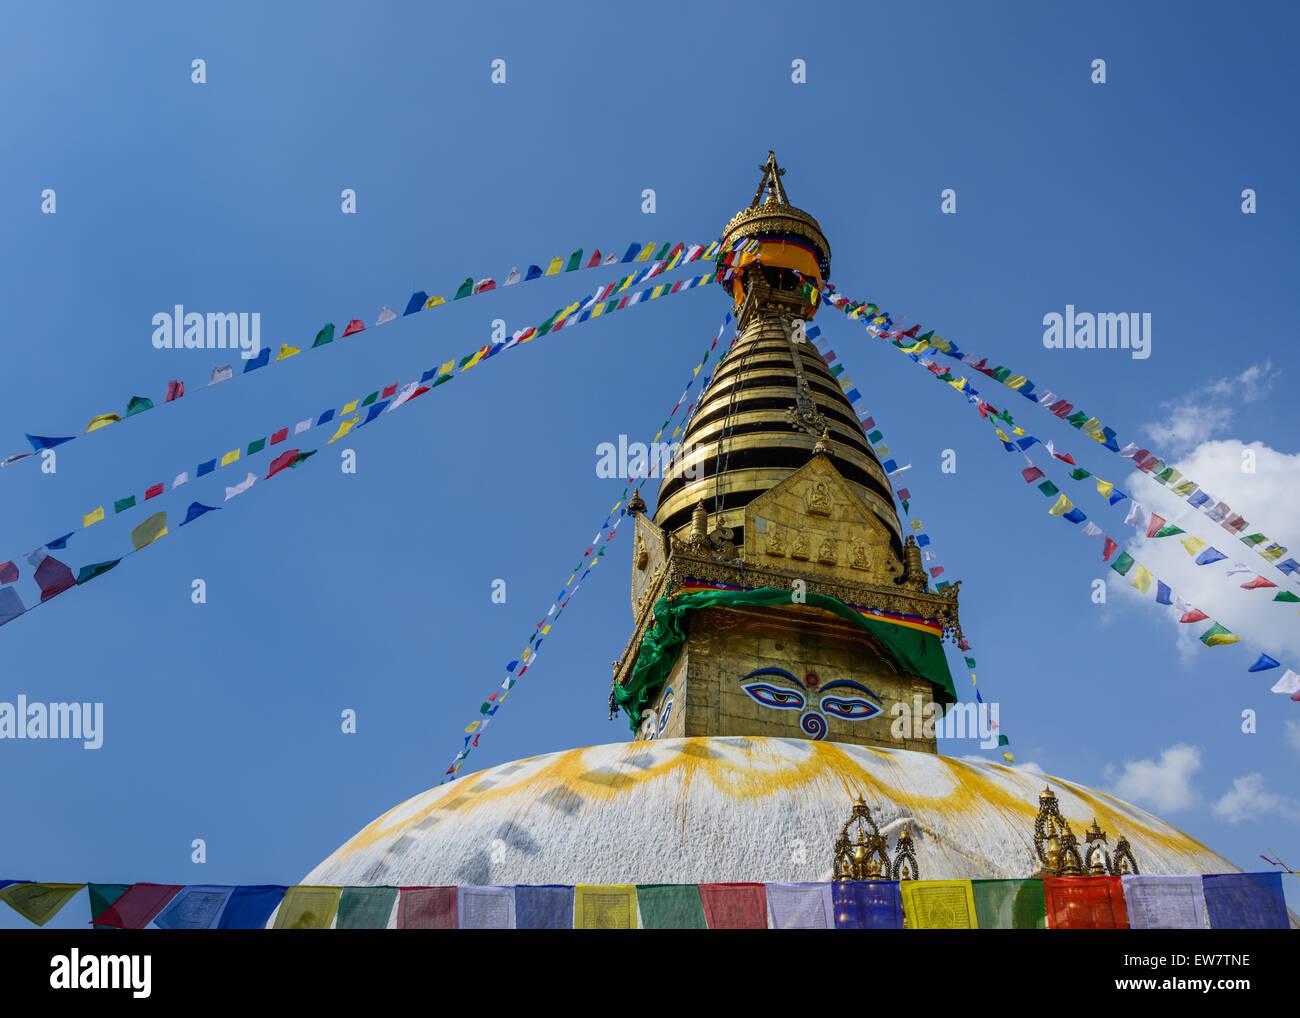 Bodnath Stupa decorated with flags, Kathmandu, Nepal - Stock Image